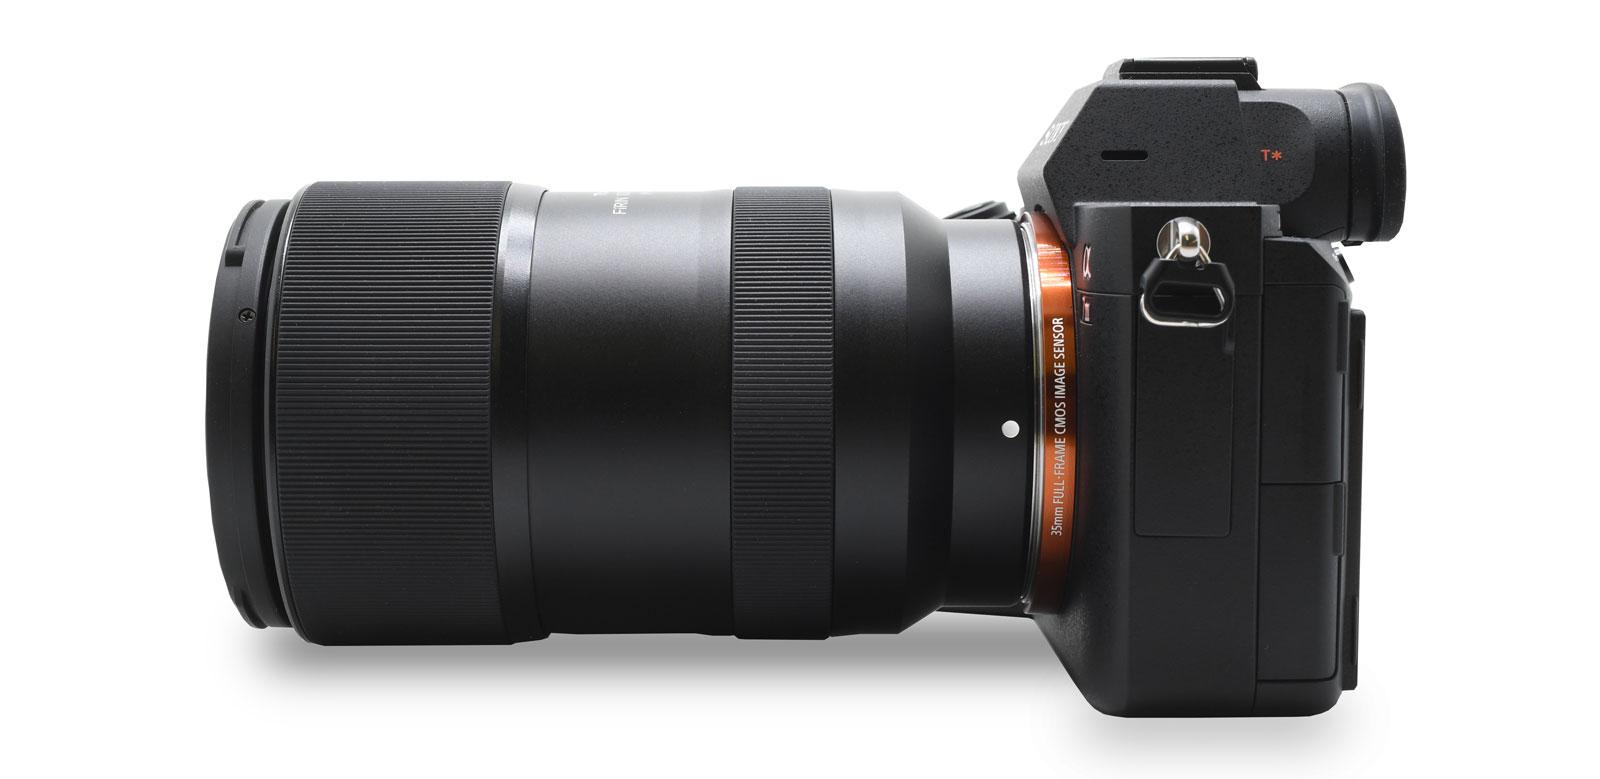 Tokina Firin 100mm F2.8 FE Macro Lens Attached to Sony Mirrorless Camera.jpg